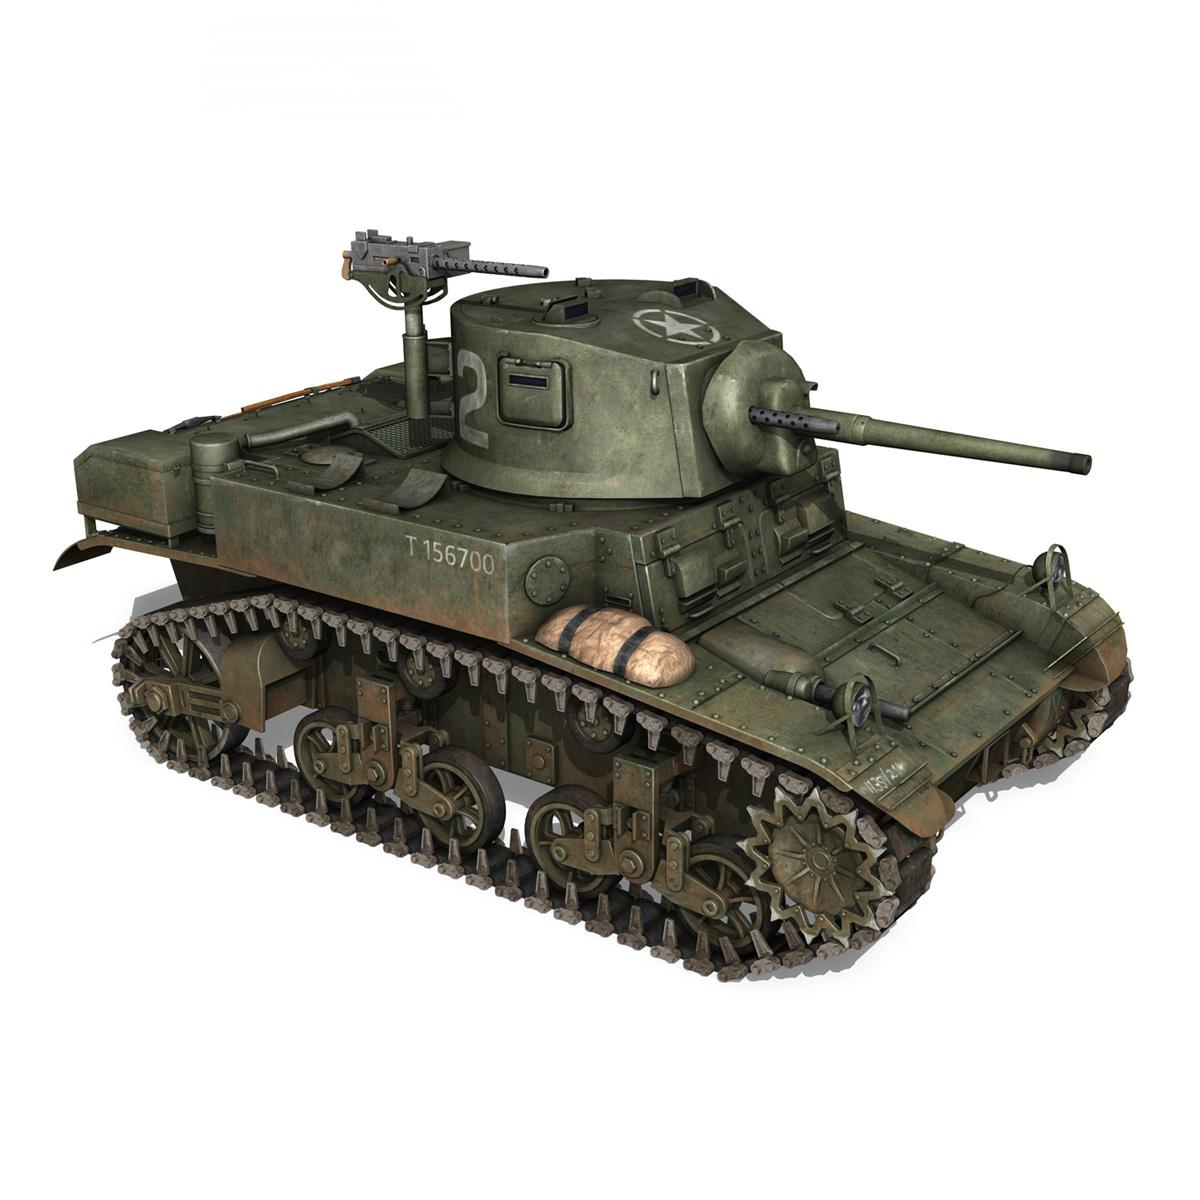 m3a1 light tank stuart – 156700 3d model c4d fbx lwo lw lws obj 3ds 265343